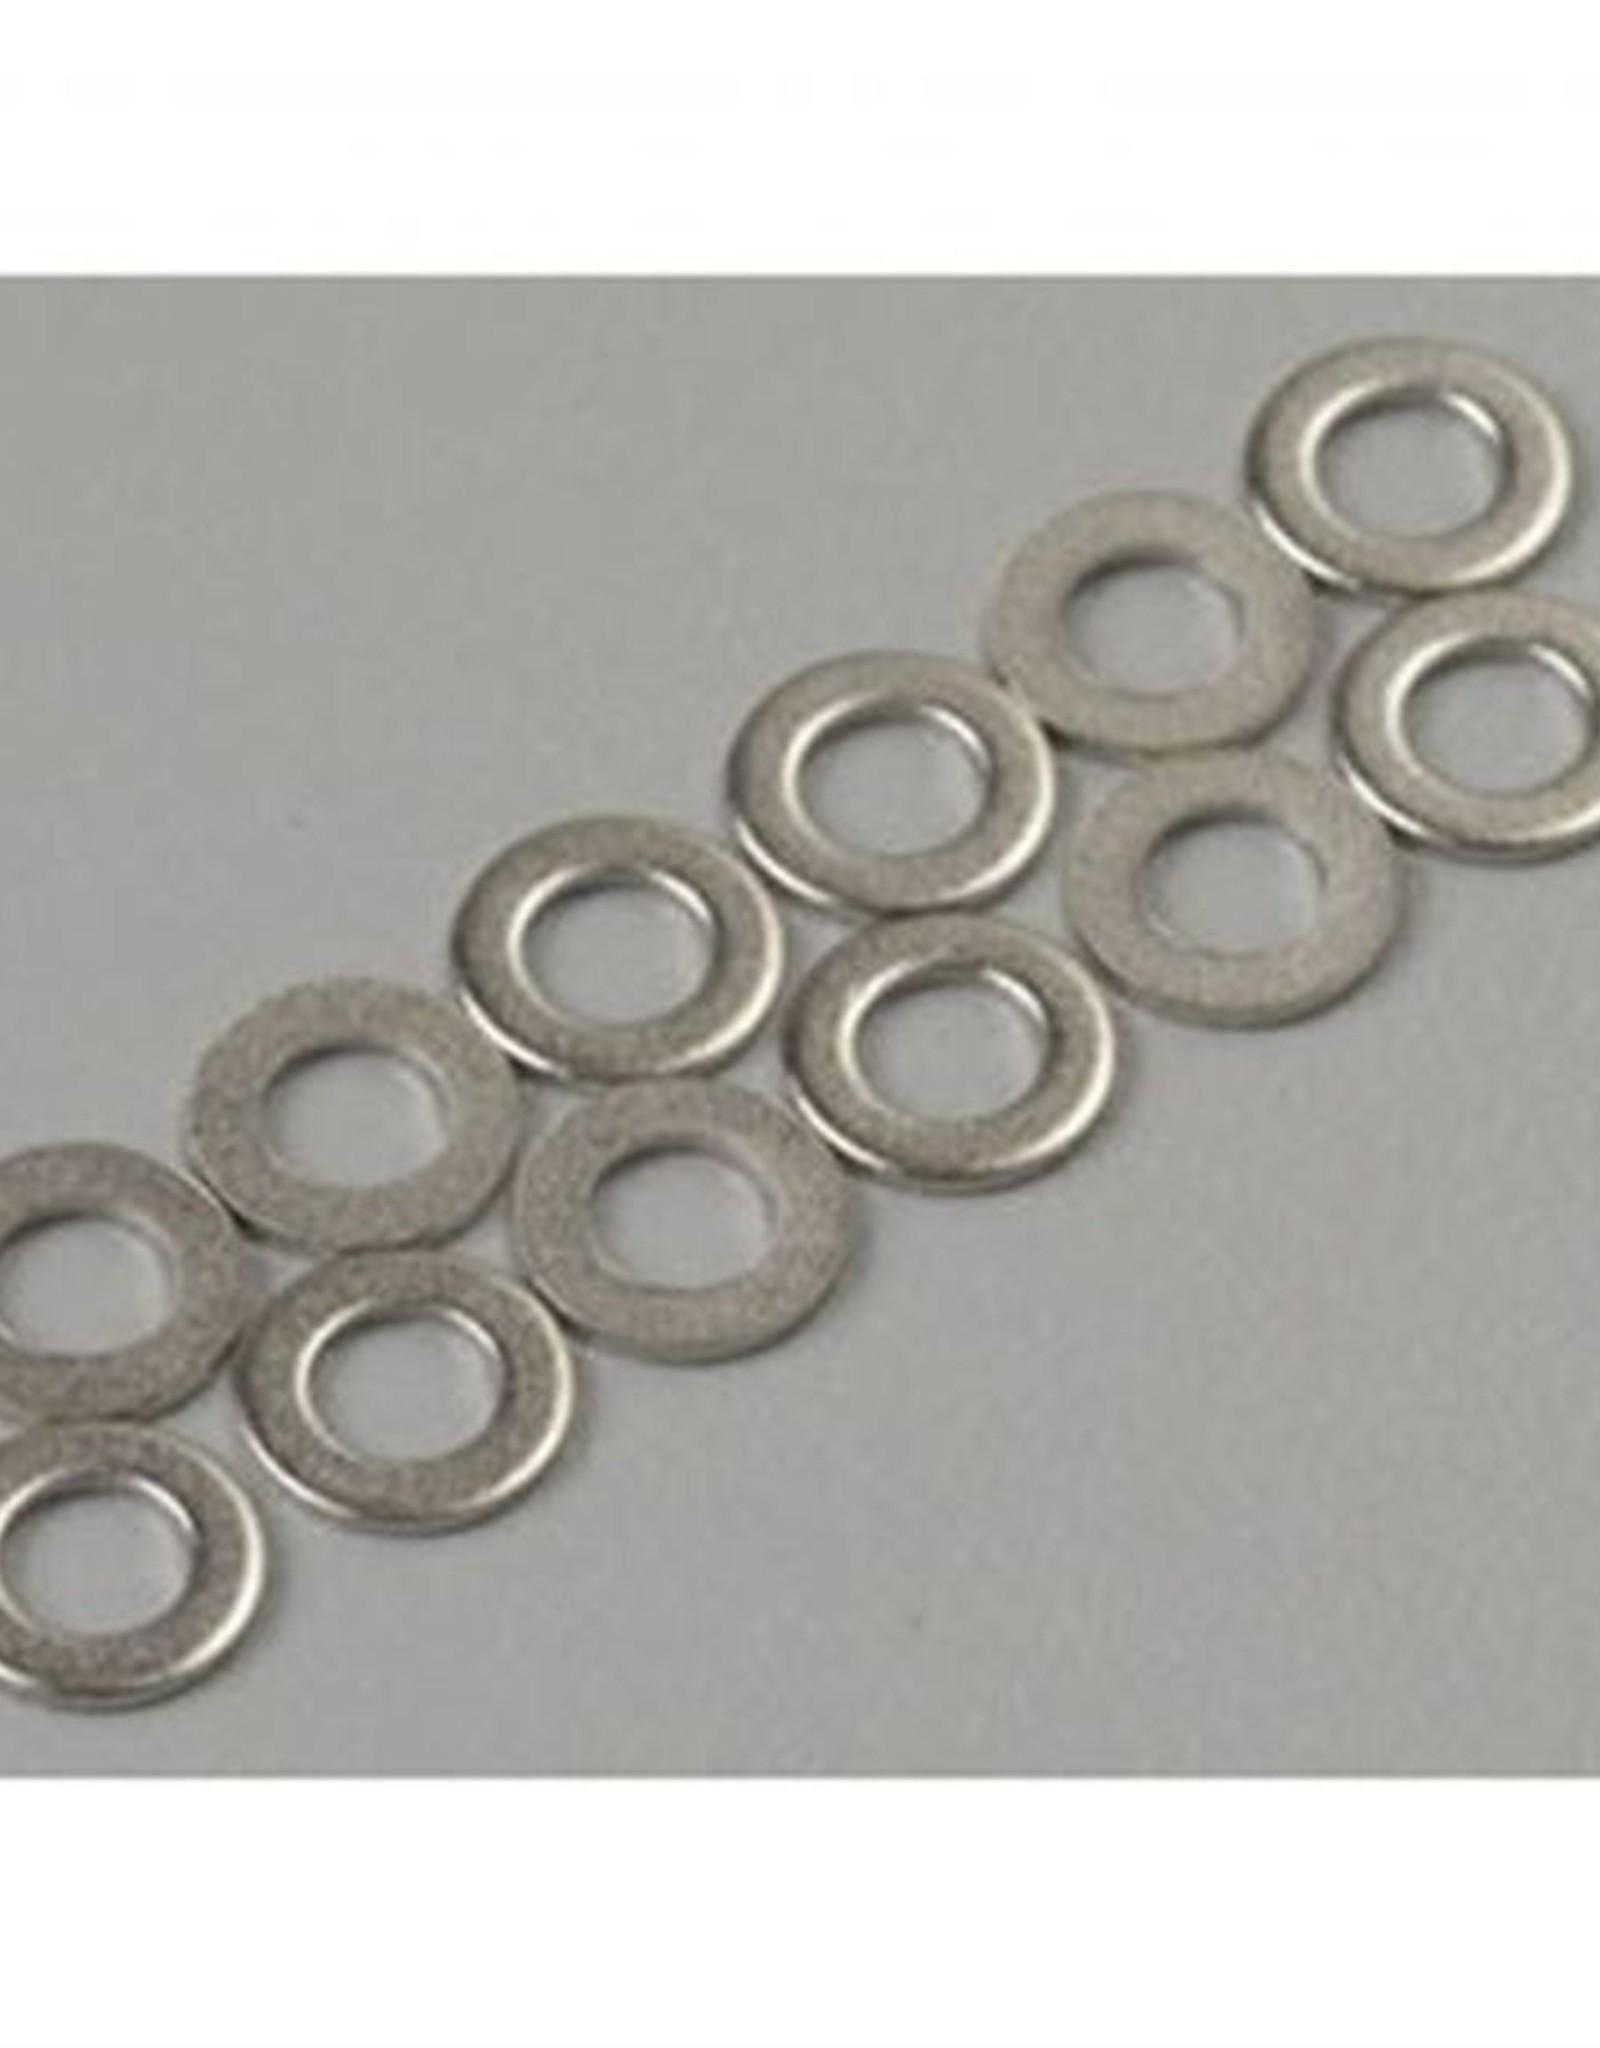 Traxxas Traxxas Metal Washers 3X6mm (12) TRA2746